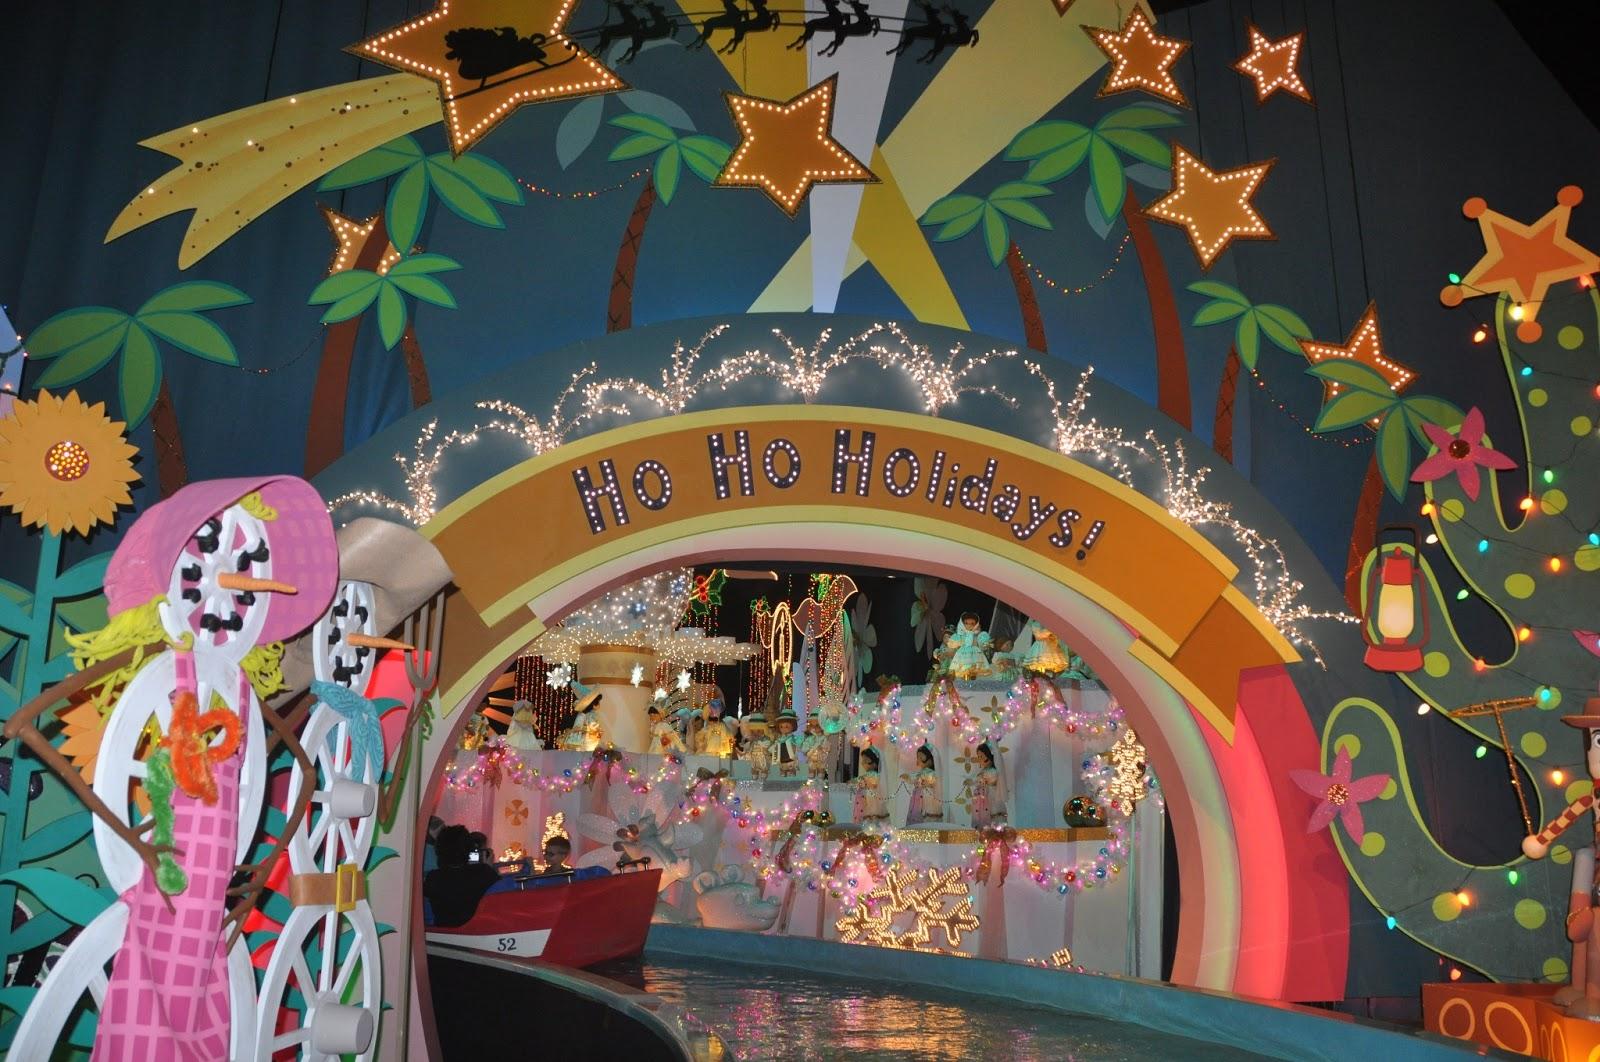 Disney, Disneyland Christmas, Disney Christmas, Disneyland, Disney fan, Disney lover, magical kingdom, what to do at Disneyland, Disney fashion, California adventure, California advenure food, whre to eat at California adventure, Disney apparel, Disney food, Disney food review, mickey mouse ears, where to eat at Disneyland, fashion blog, fashion blogger, style blog, style blogger, mens fashion, mens fashion blog, mens style, mens style blog, womens style blog, anthropologie ootd blog, anthropologie ootd, anthropologie, ootd, mens ootd, womens ootd,